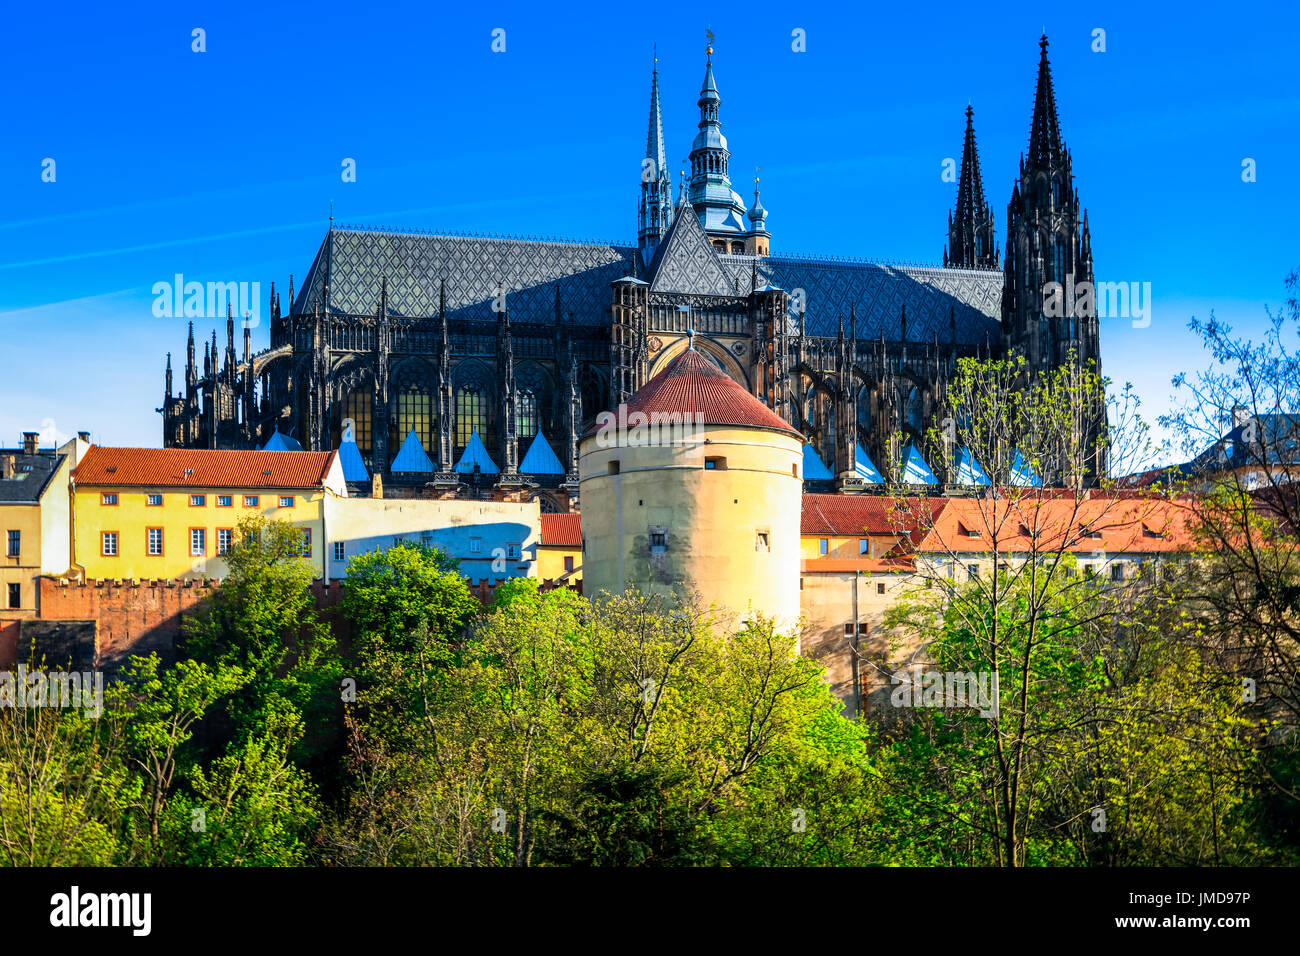 Europe, Czech Republic, Czechia, Prague, Praha, Historical Old Town, UNESCO, Prague Castle, Prazsky hrad, St. Vitus Stock Photo